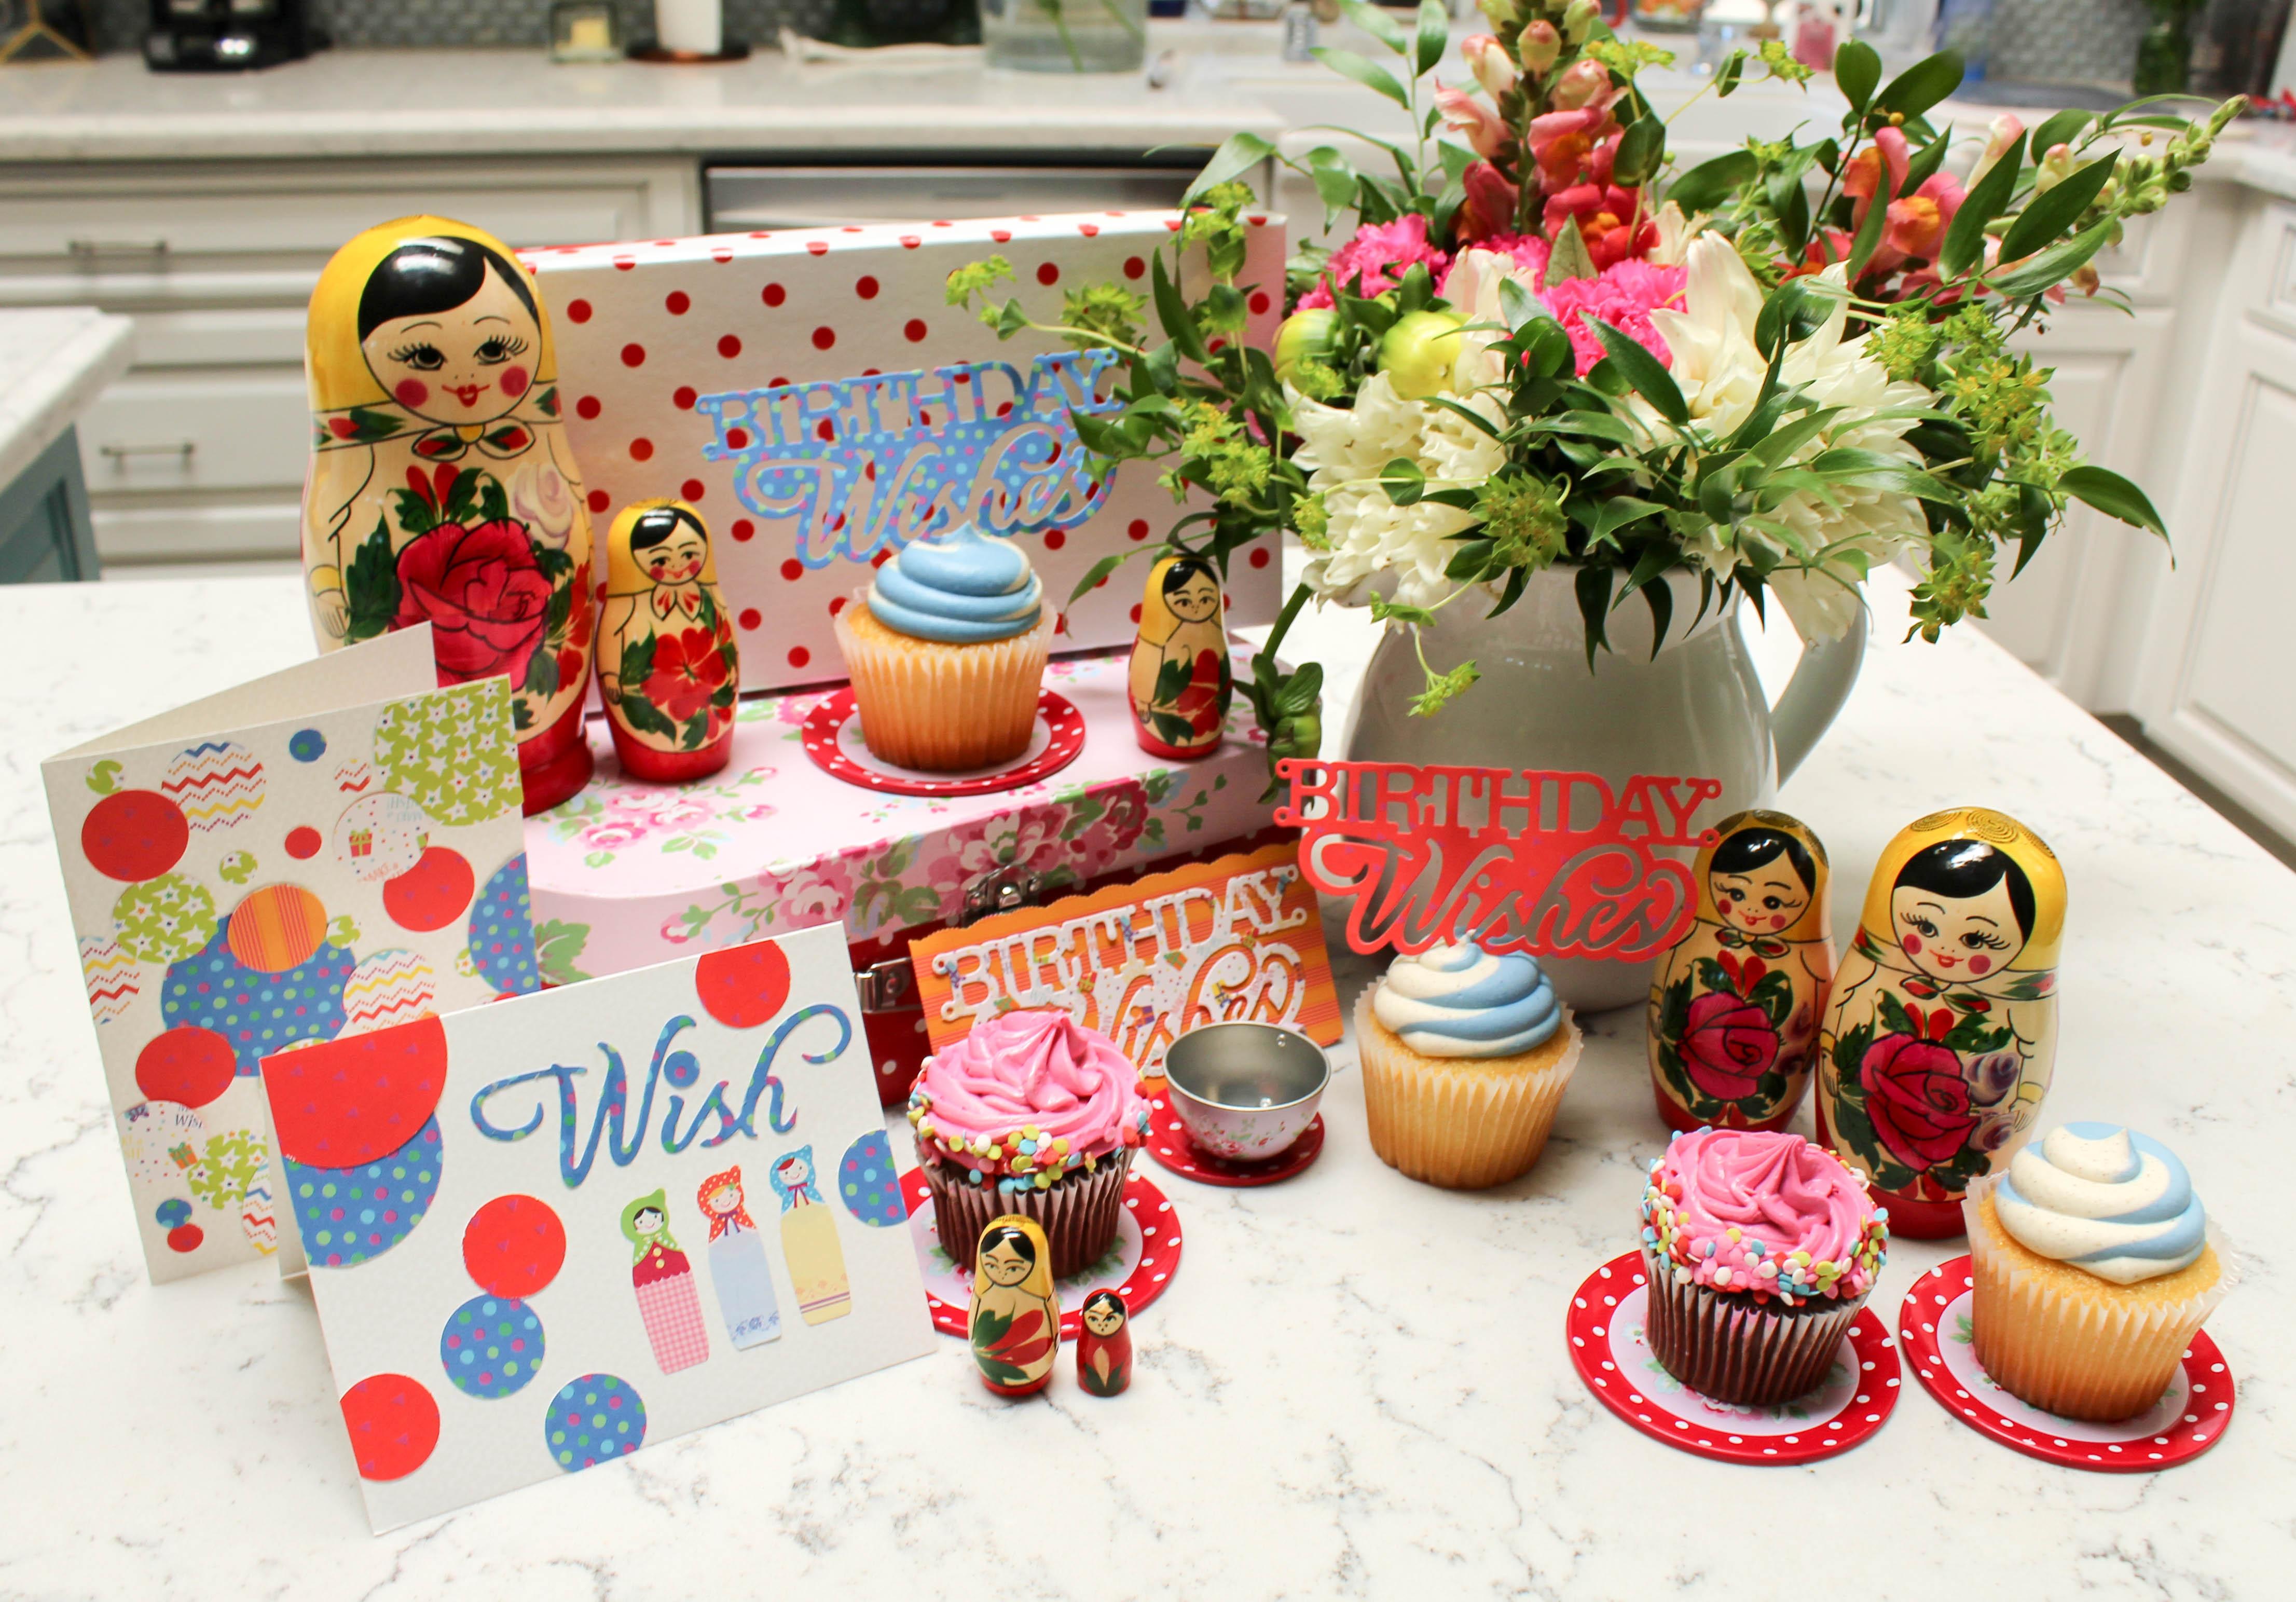 matroyshka nesting dolls where women cook sizzix dies birthday wishes cake topper-36